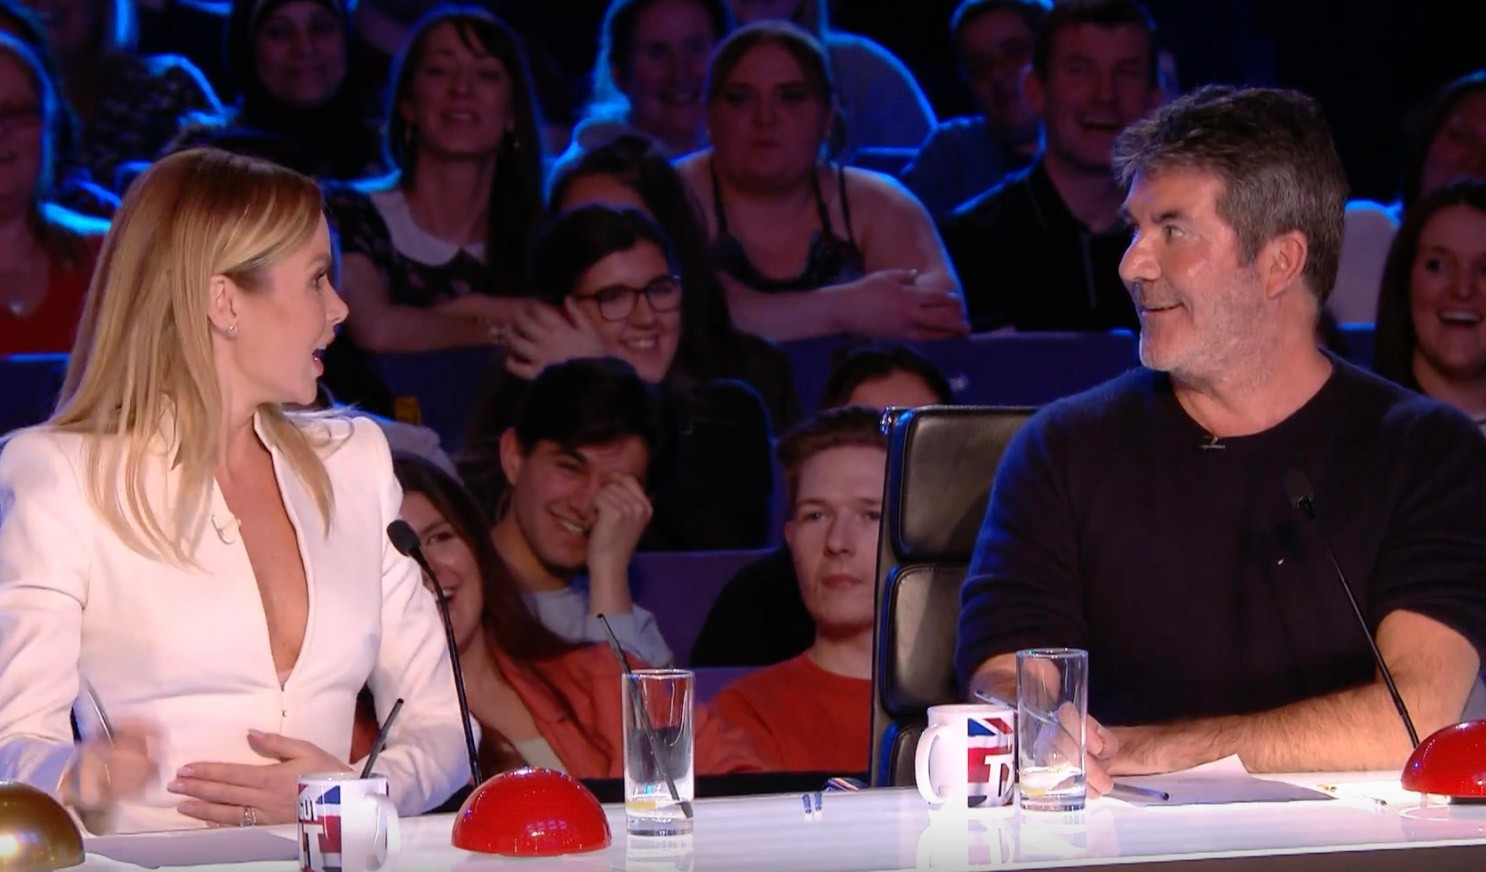 Britain's Got Talent Amanda Holden, Simon Cowell